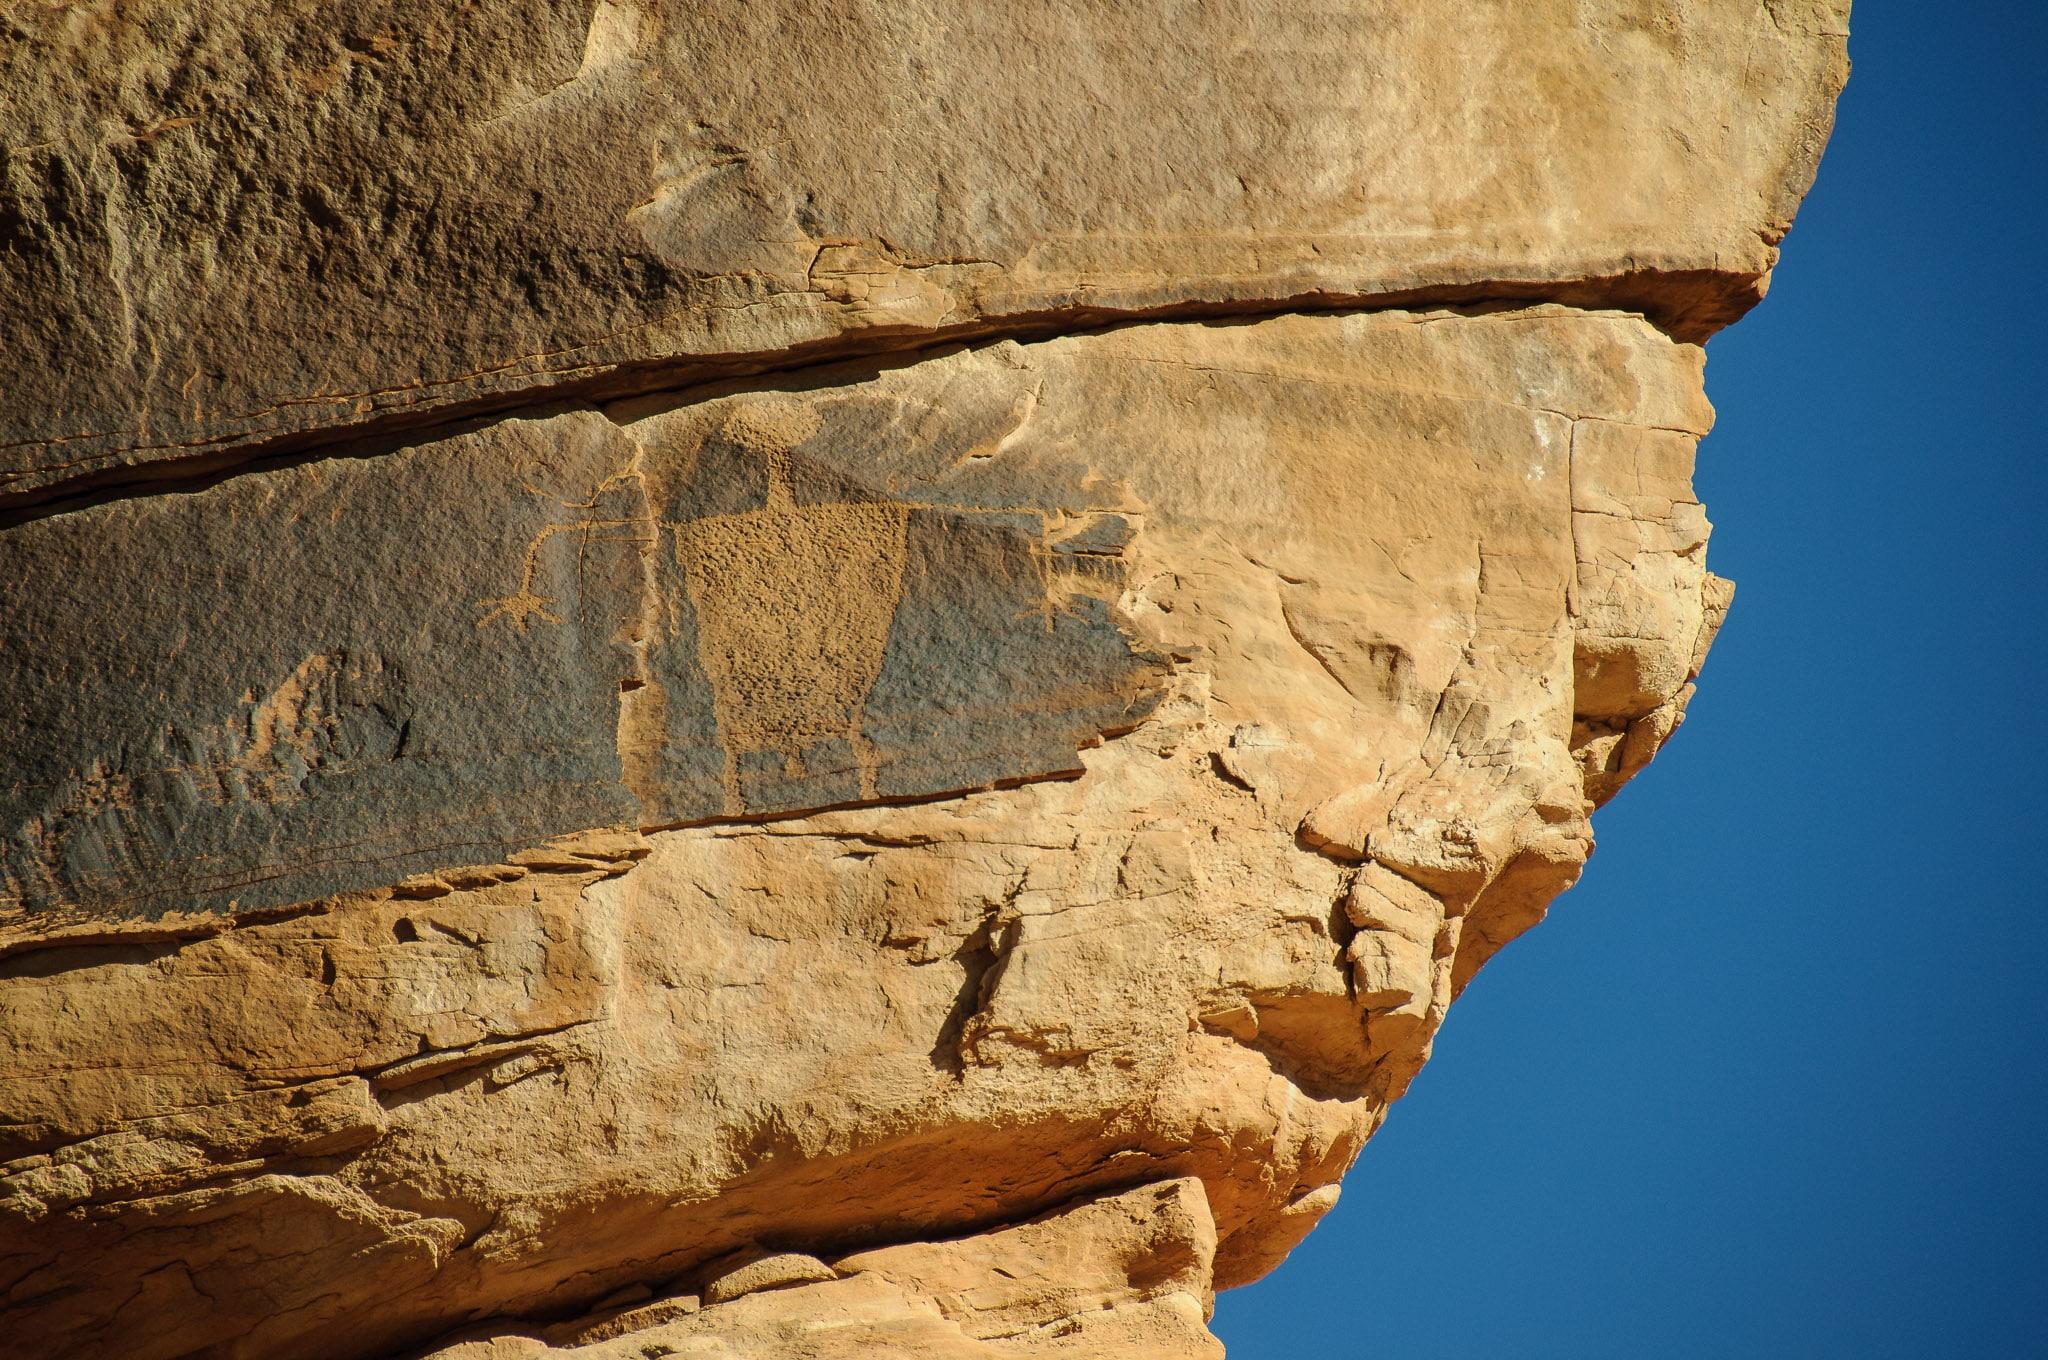 Petroglyph overlooks Cub Creek Road In Dinosaur National Monument.